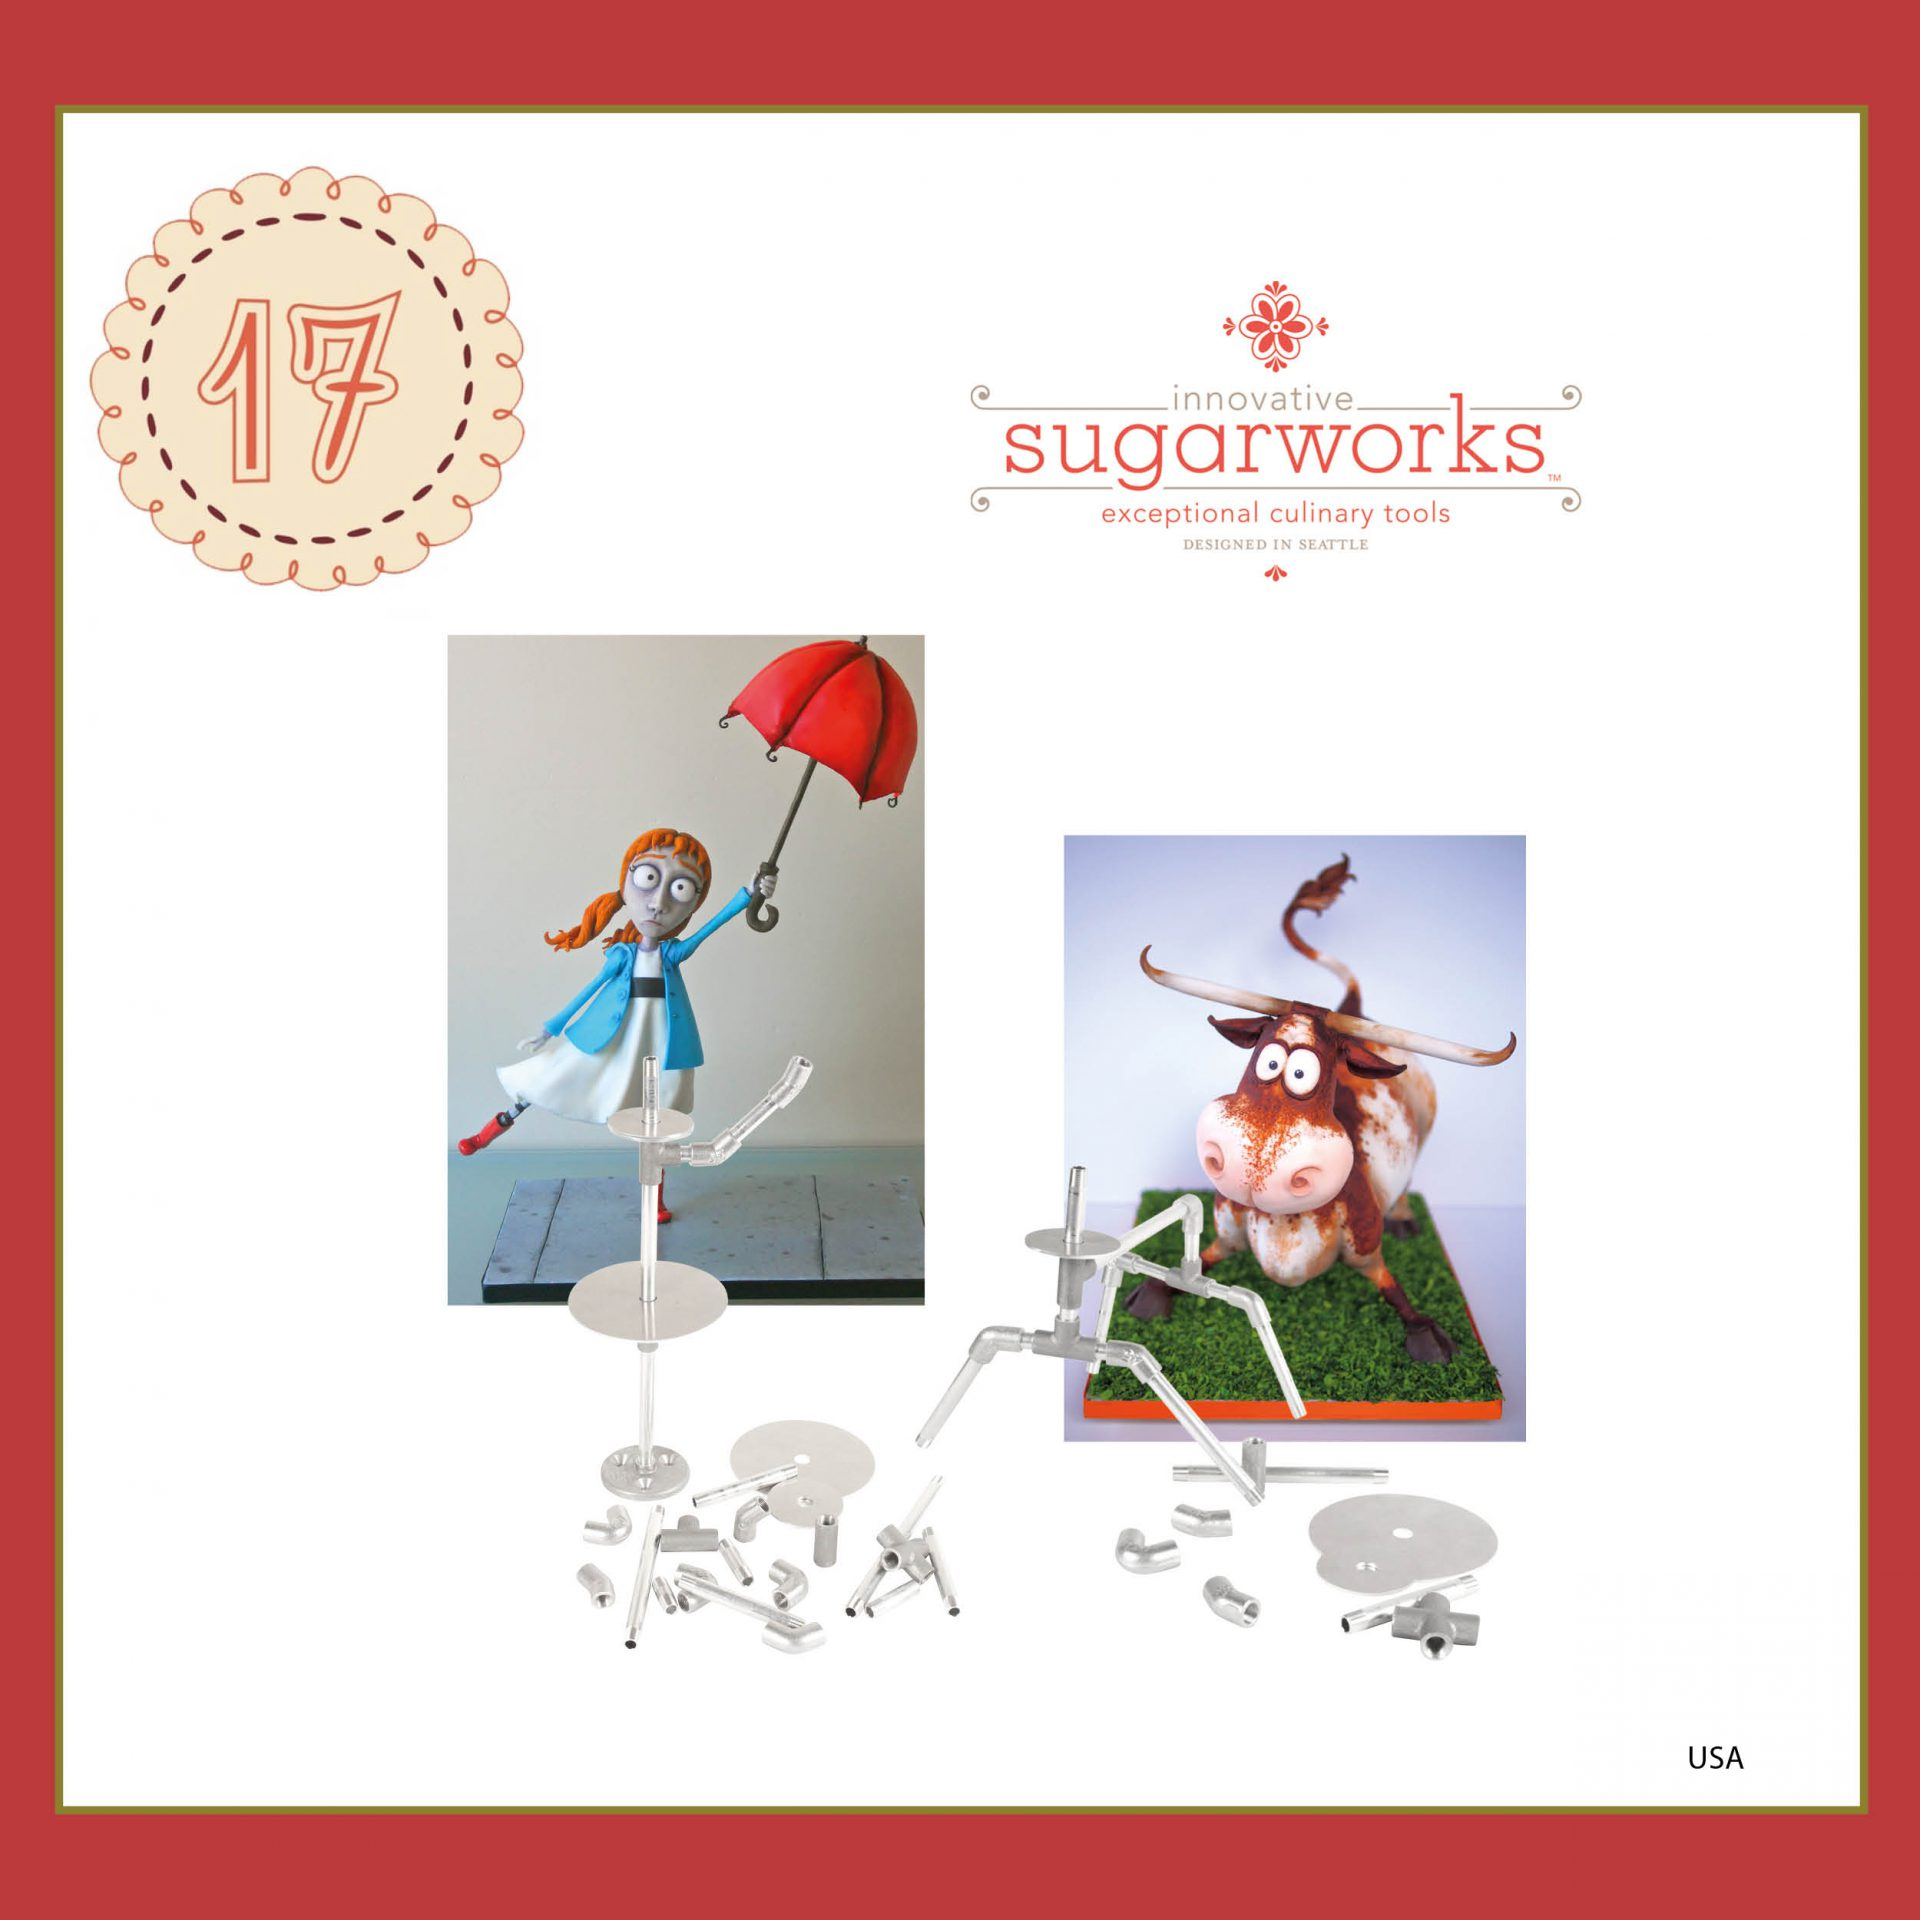 17th-december-innovative-sugarworks